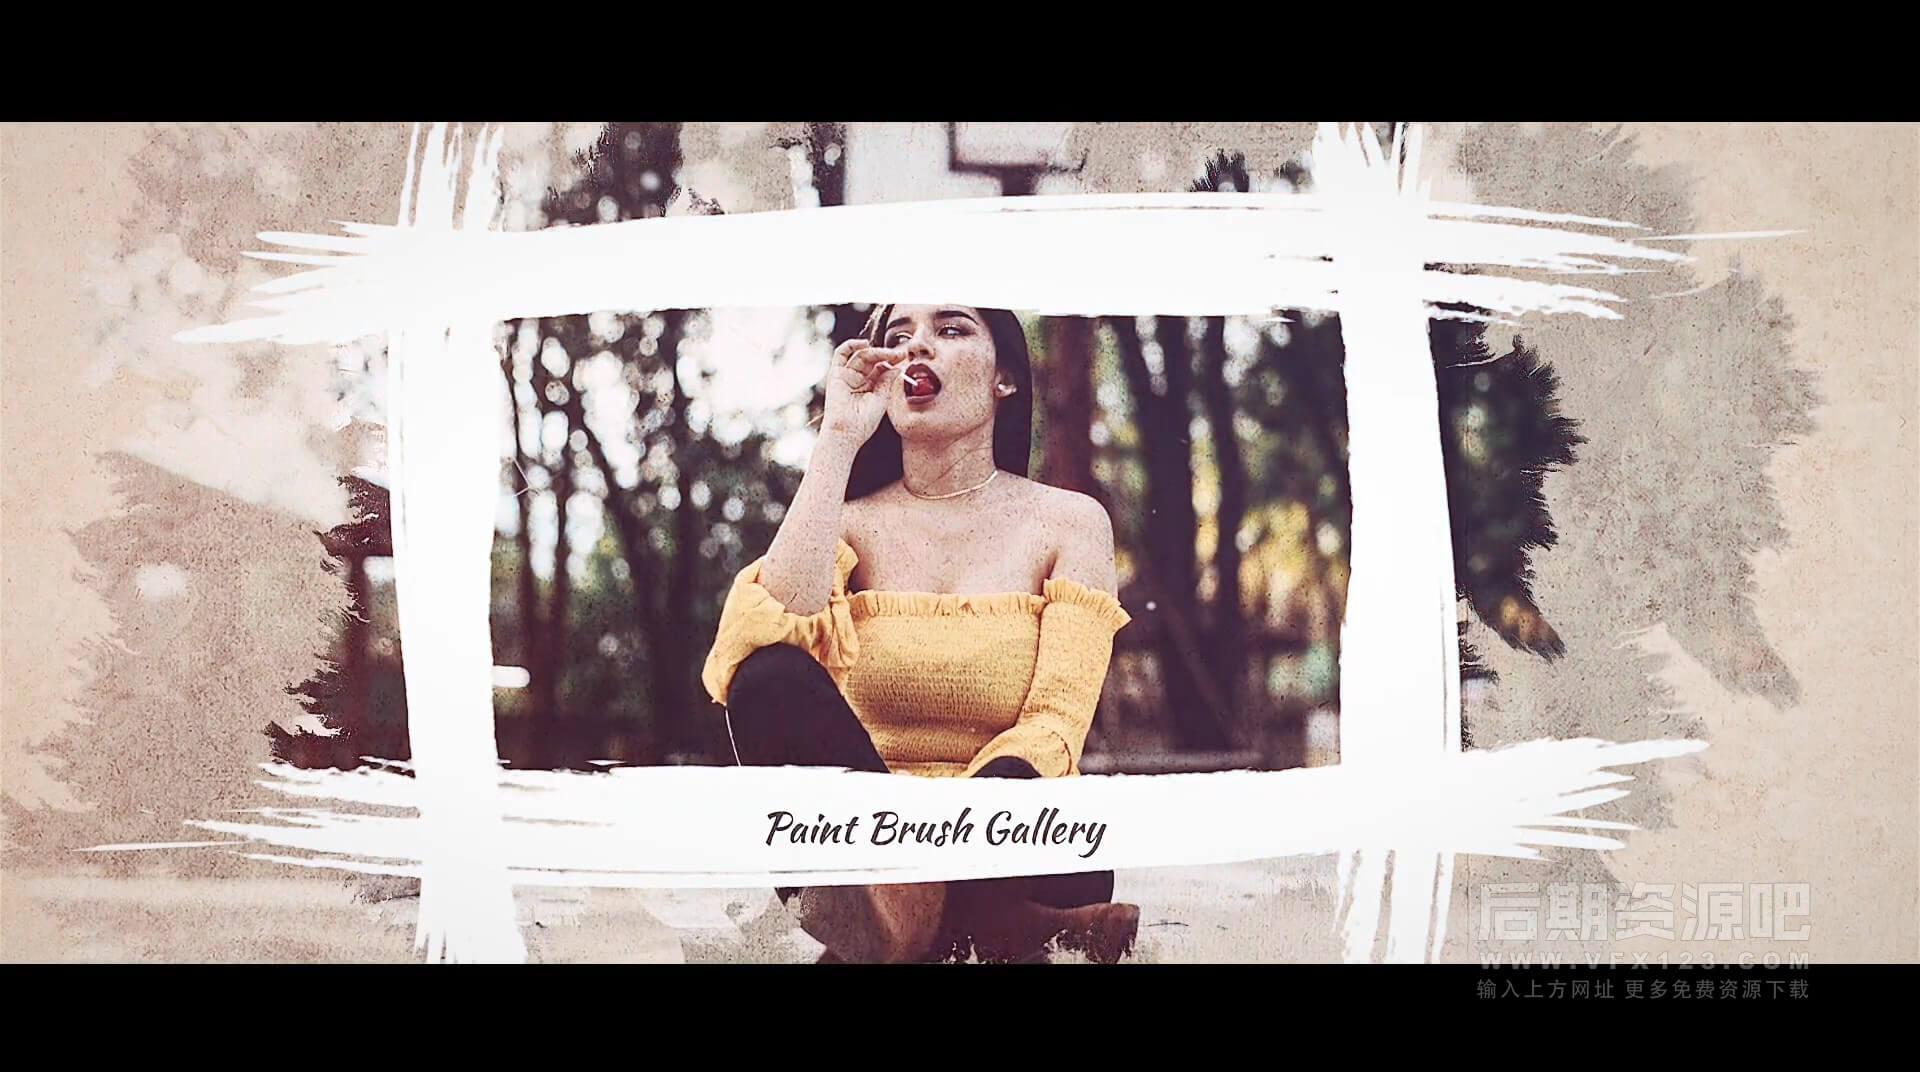 FCPX主题插件 浪漫唯美复古手绘笔刷图片视频展示模板 Brush Paint Gallery